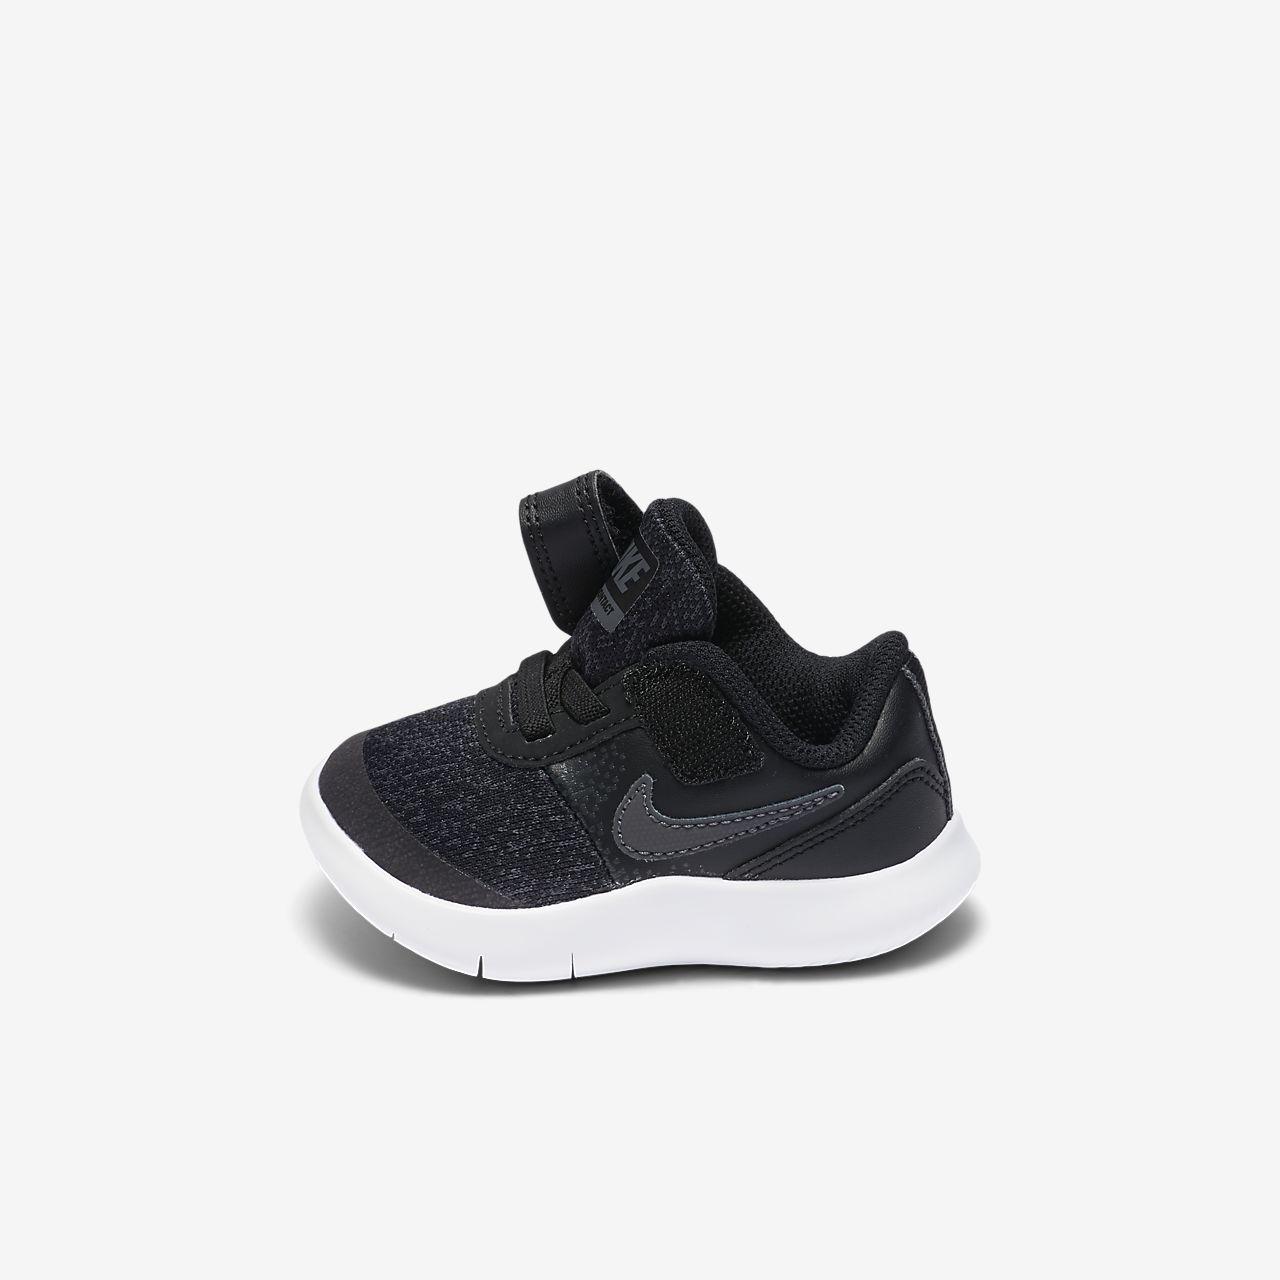 Nike Chaussures Flex Contact Nicekicks À Vendre Bon Marché iz4h33ZKi